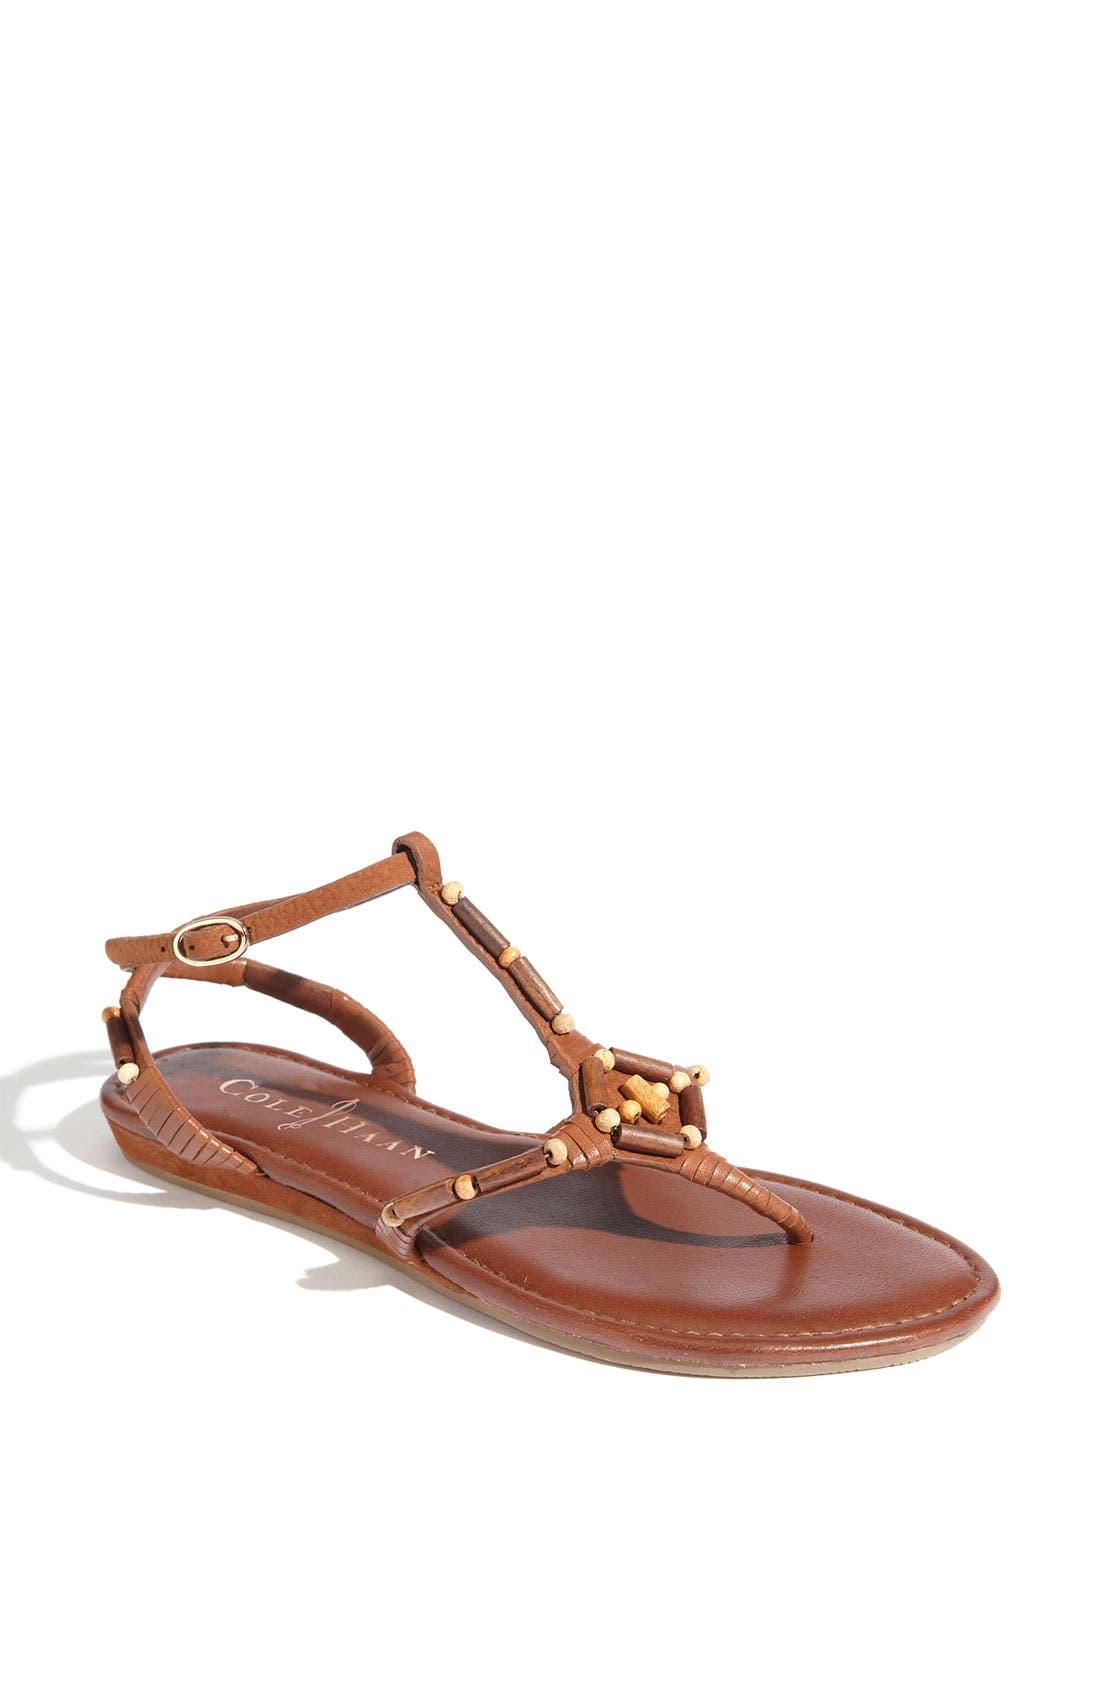 Main Image - Cole Haan 'Air Larissa' Sandal